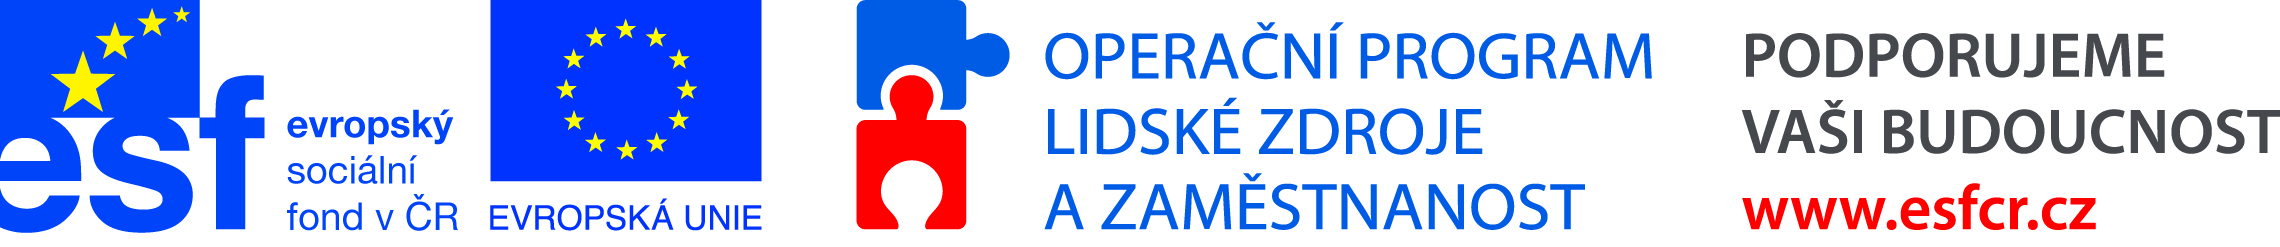 esf_eu_oplzz_podporujeme_horizontal_cmyk_2.jpg